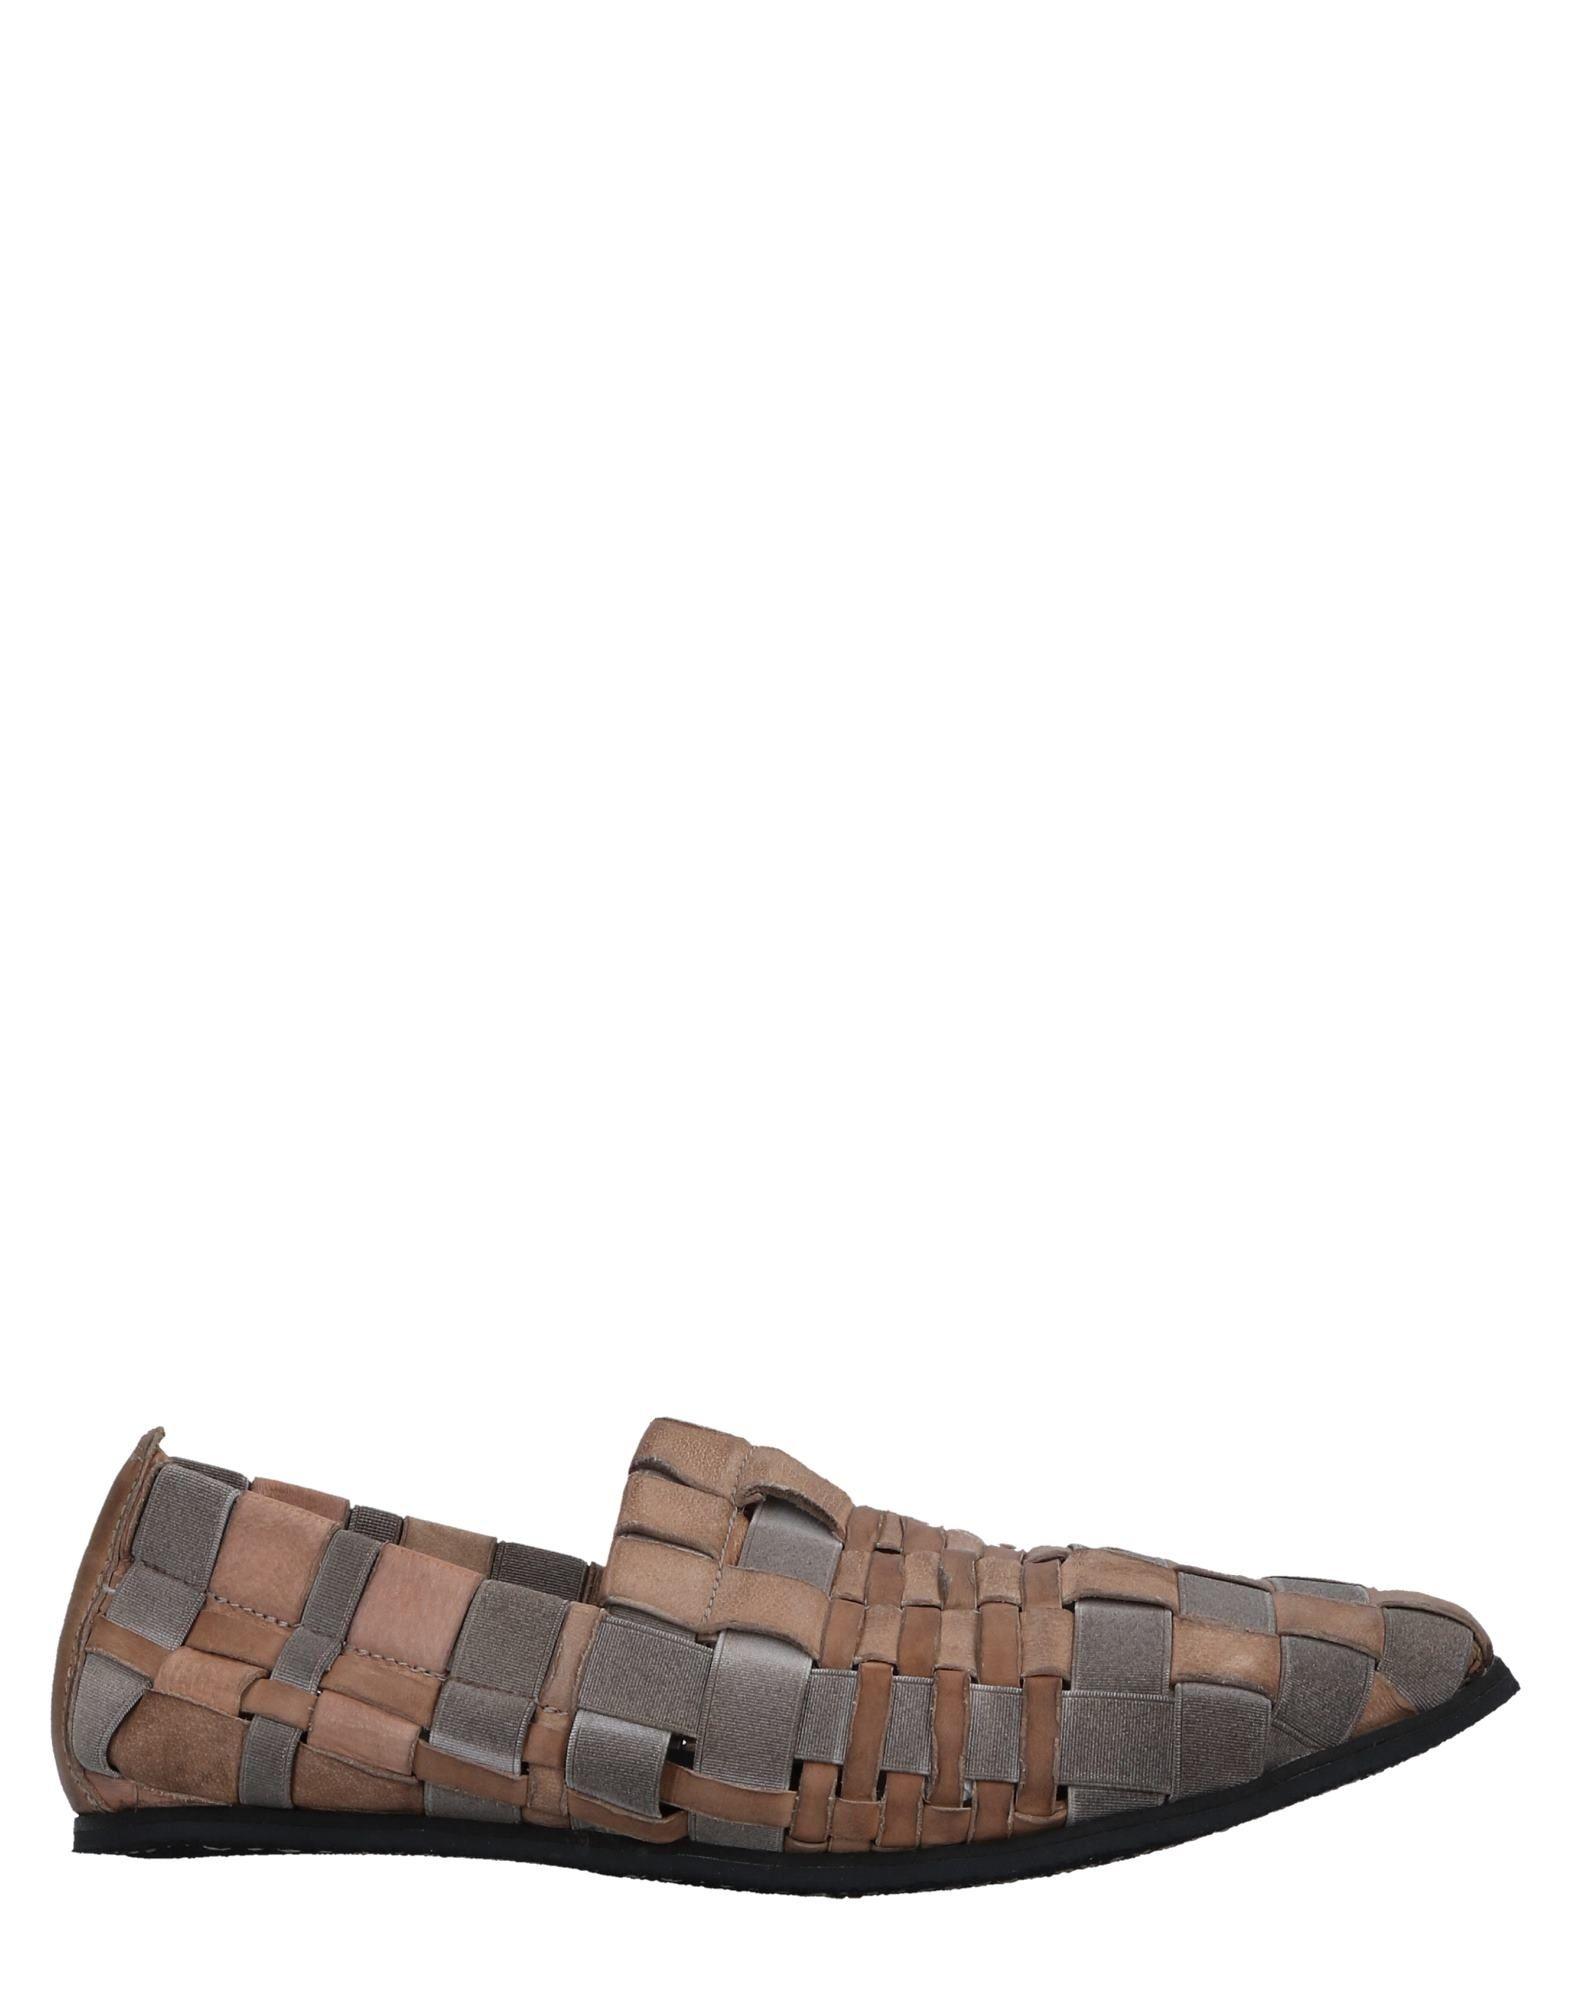 Mocassino Open Closed  Shoes 11514545DF Donna - 11514545DF Shoes 2988d9